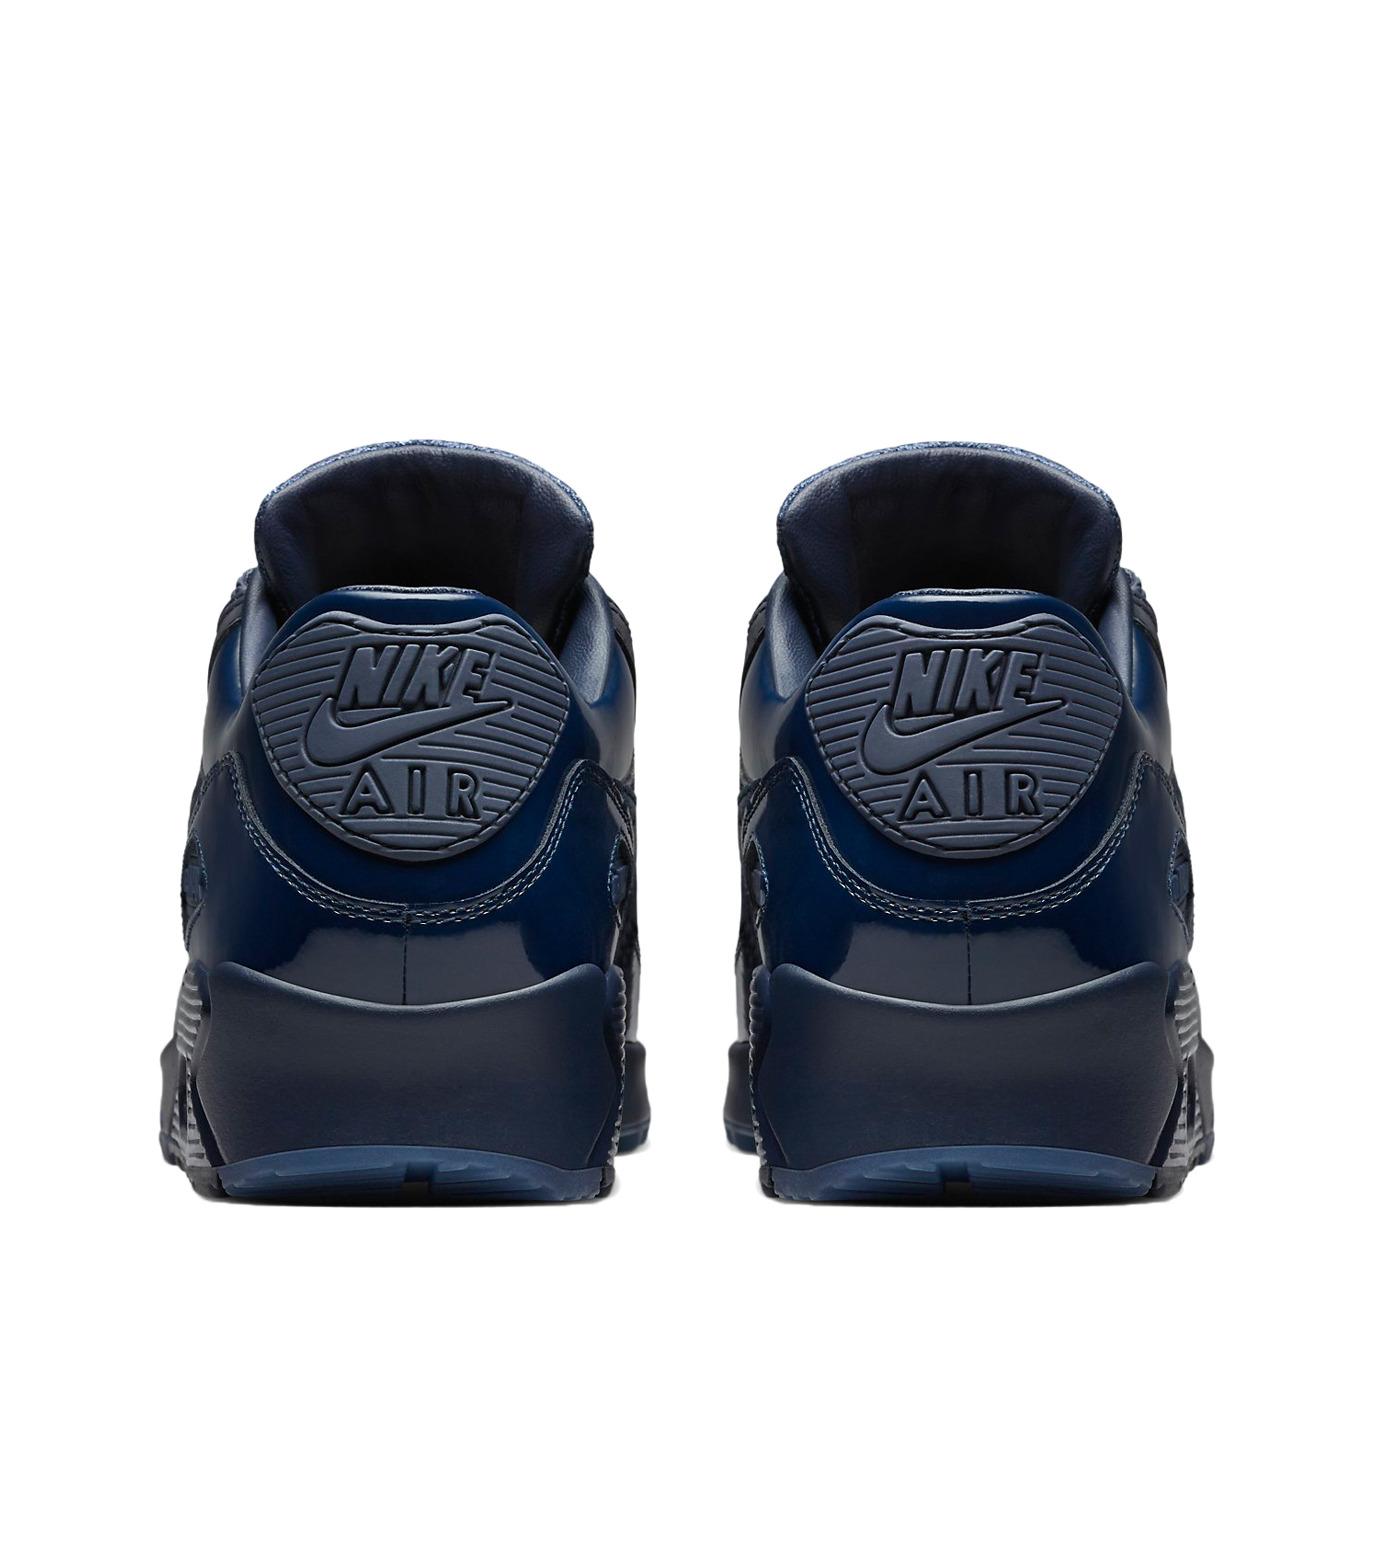 NIKE(ナイキ)のWMNS AIR MAX PEDRO LOURENCO-BLUE(シューズ/shoes)-867116-400-92 拡大詳細画像5